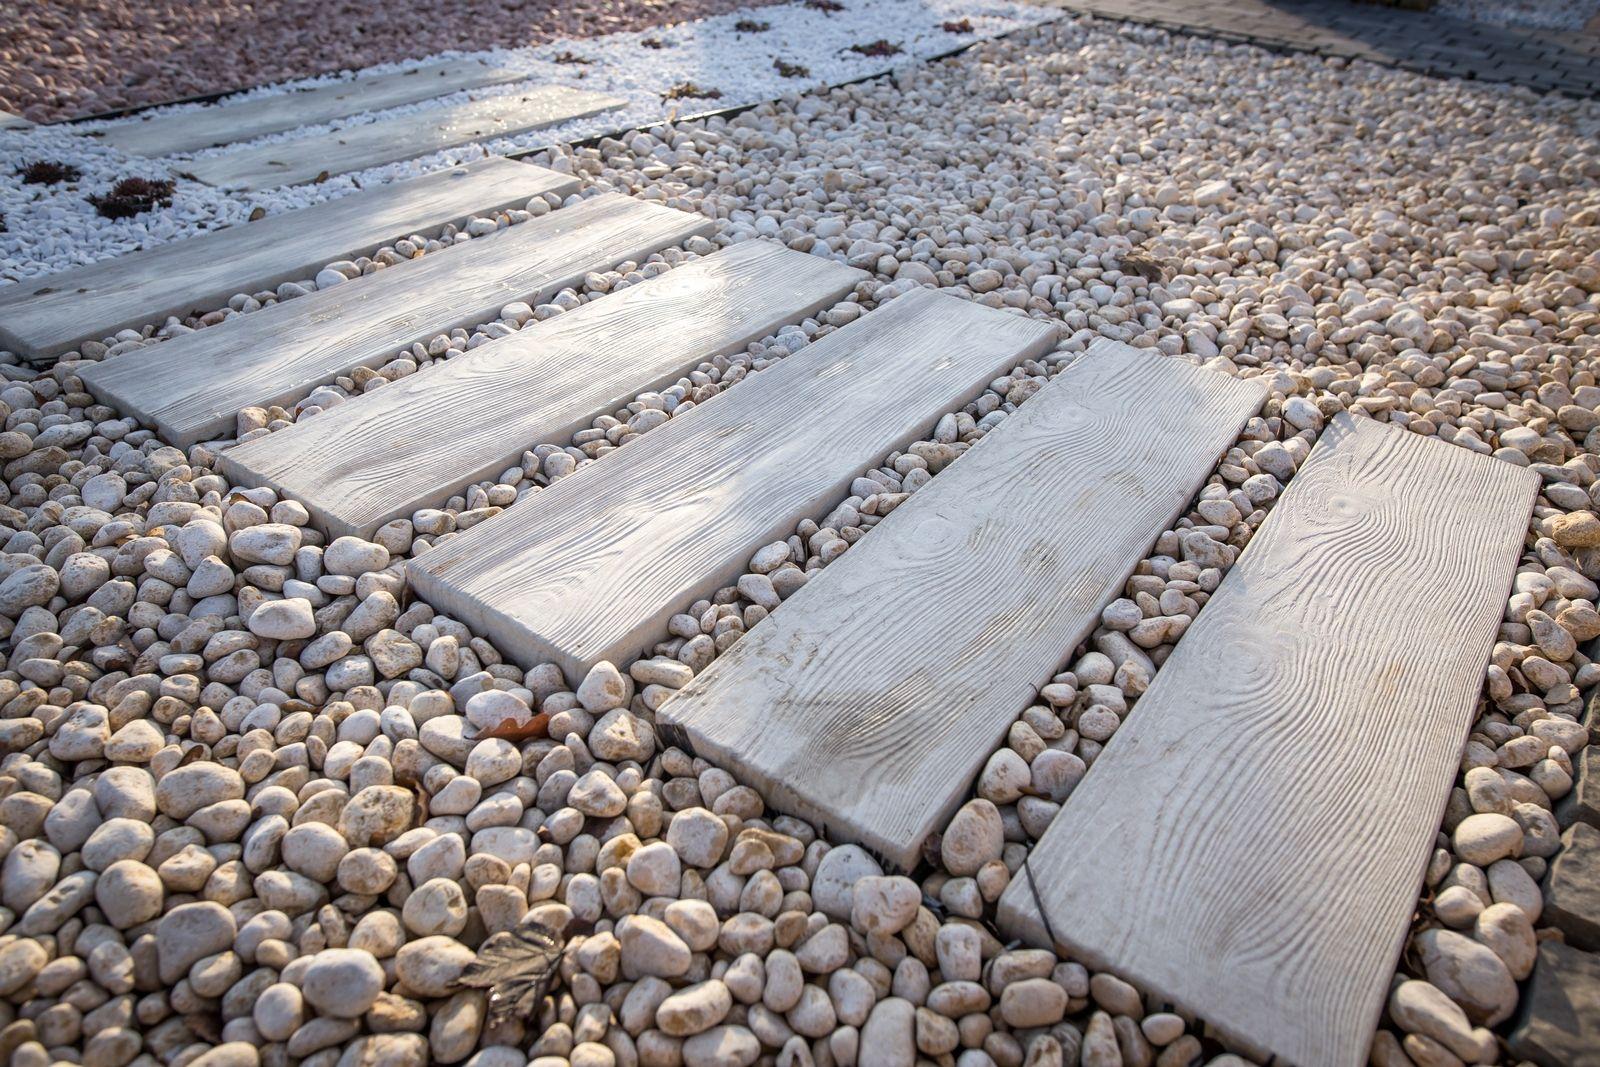 Plyty Tarasowe Madera Libet Outdoor Blanket Outdoor Decor Picnic Blanket